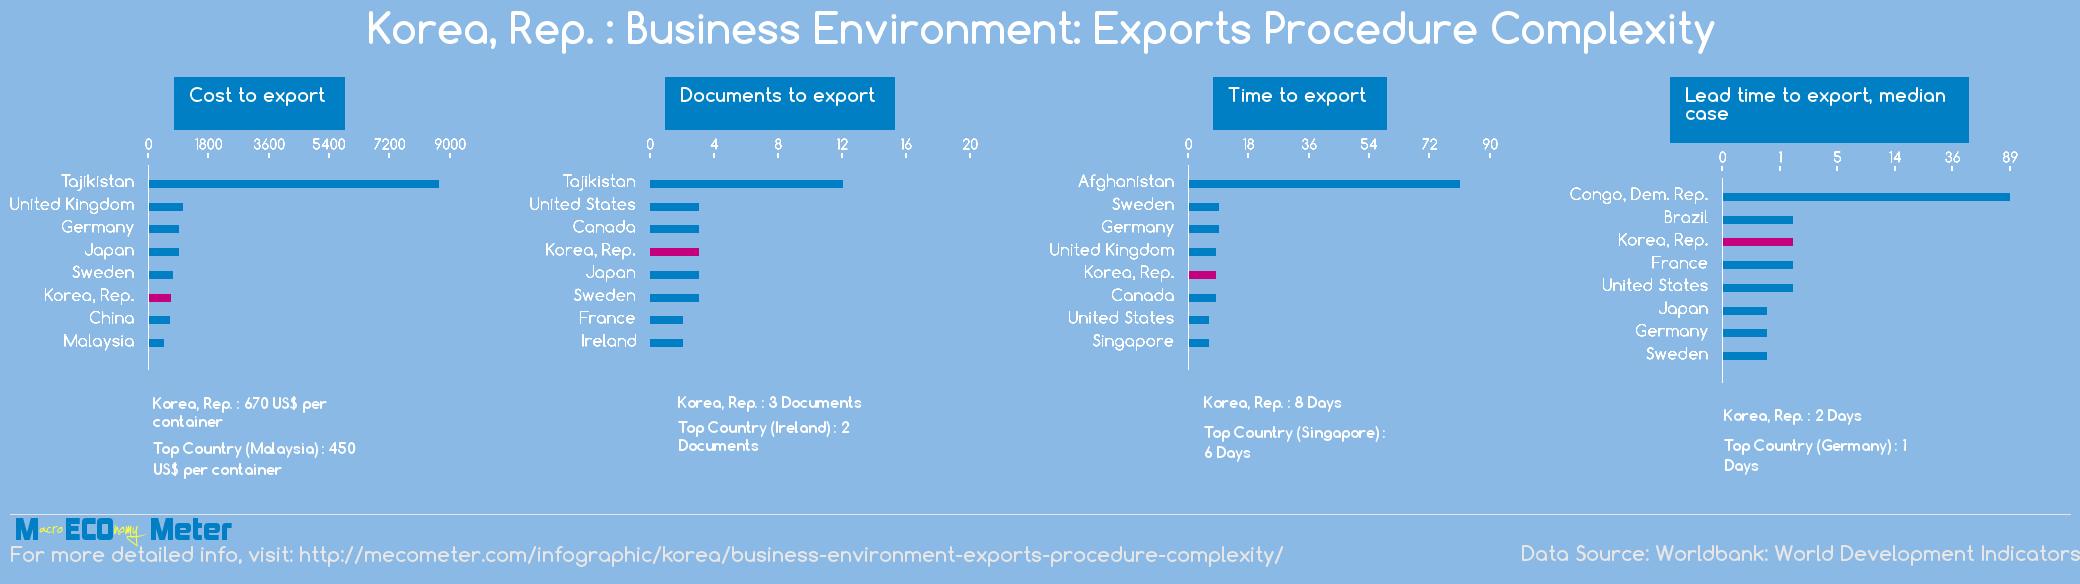 Korea, Rep. : Business Environment: Exports Procedure Complexity